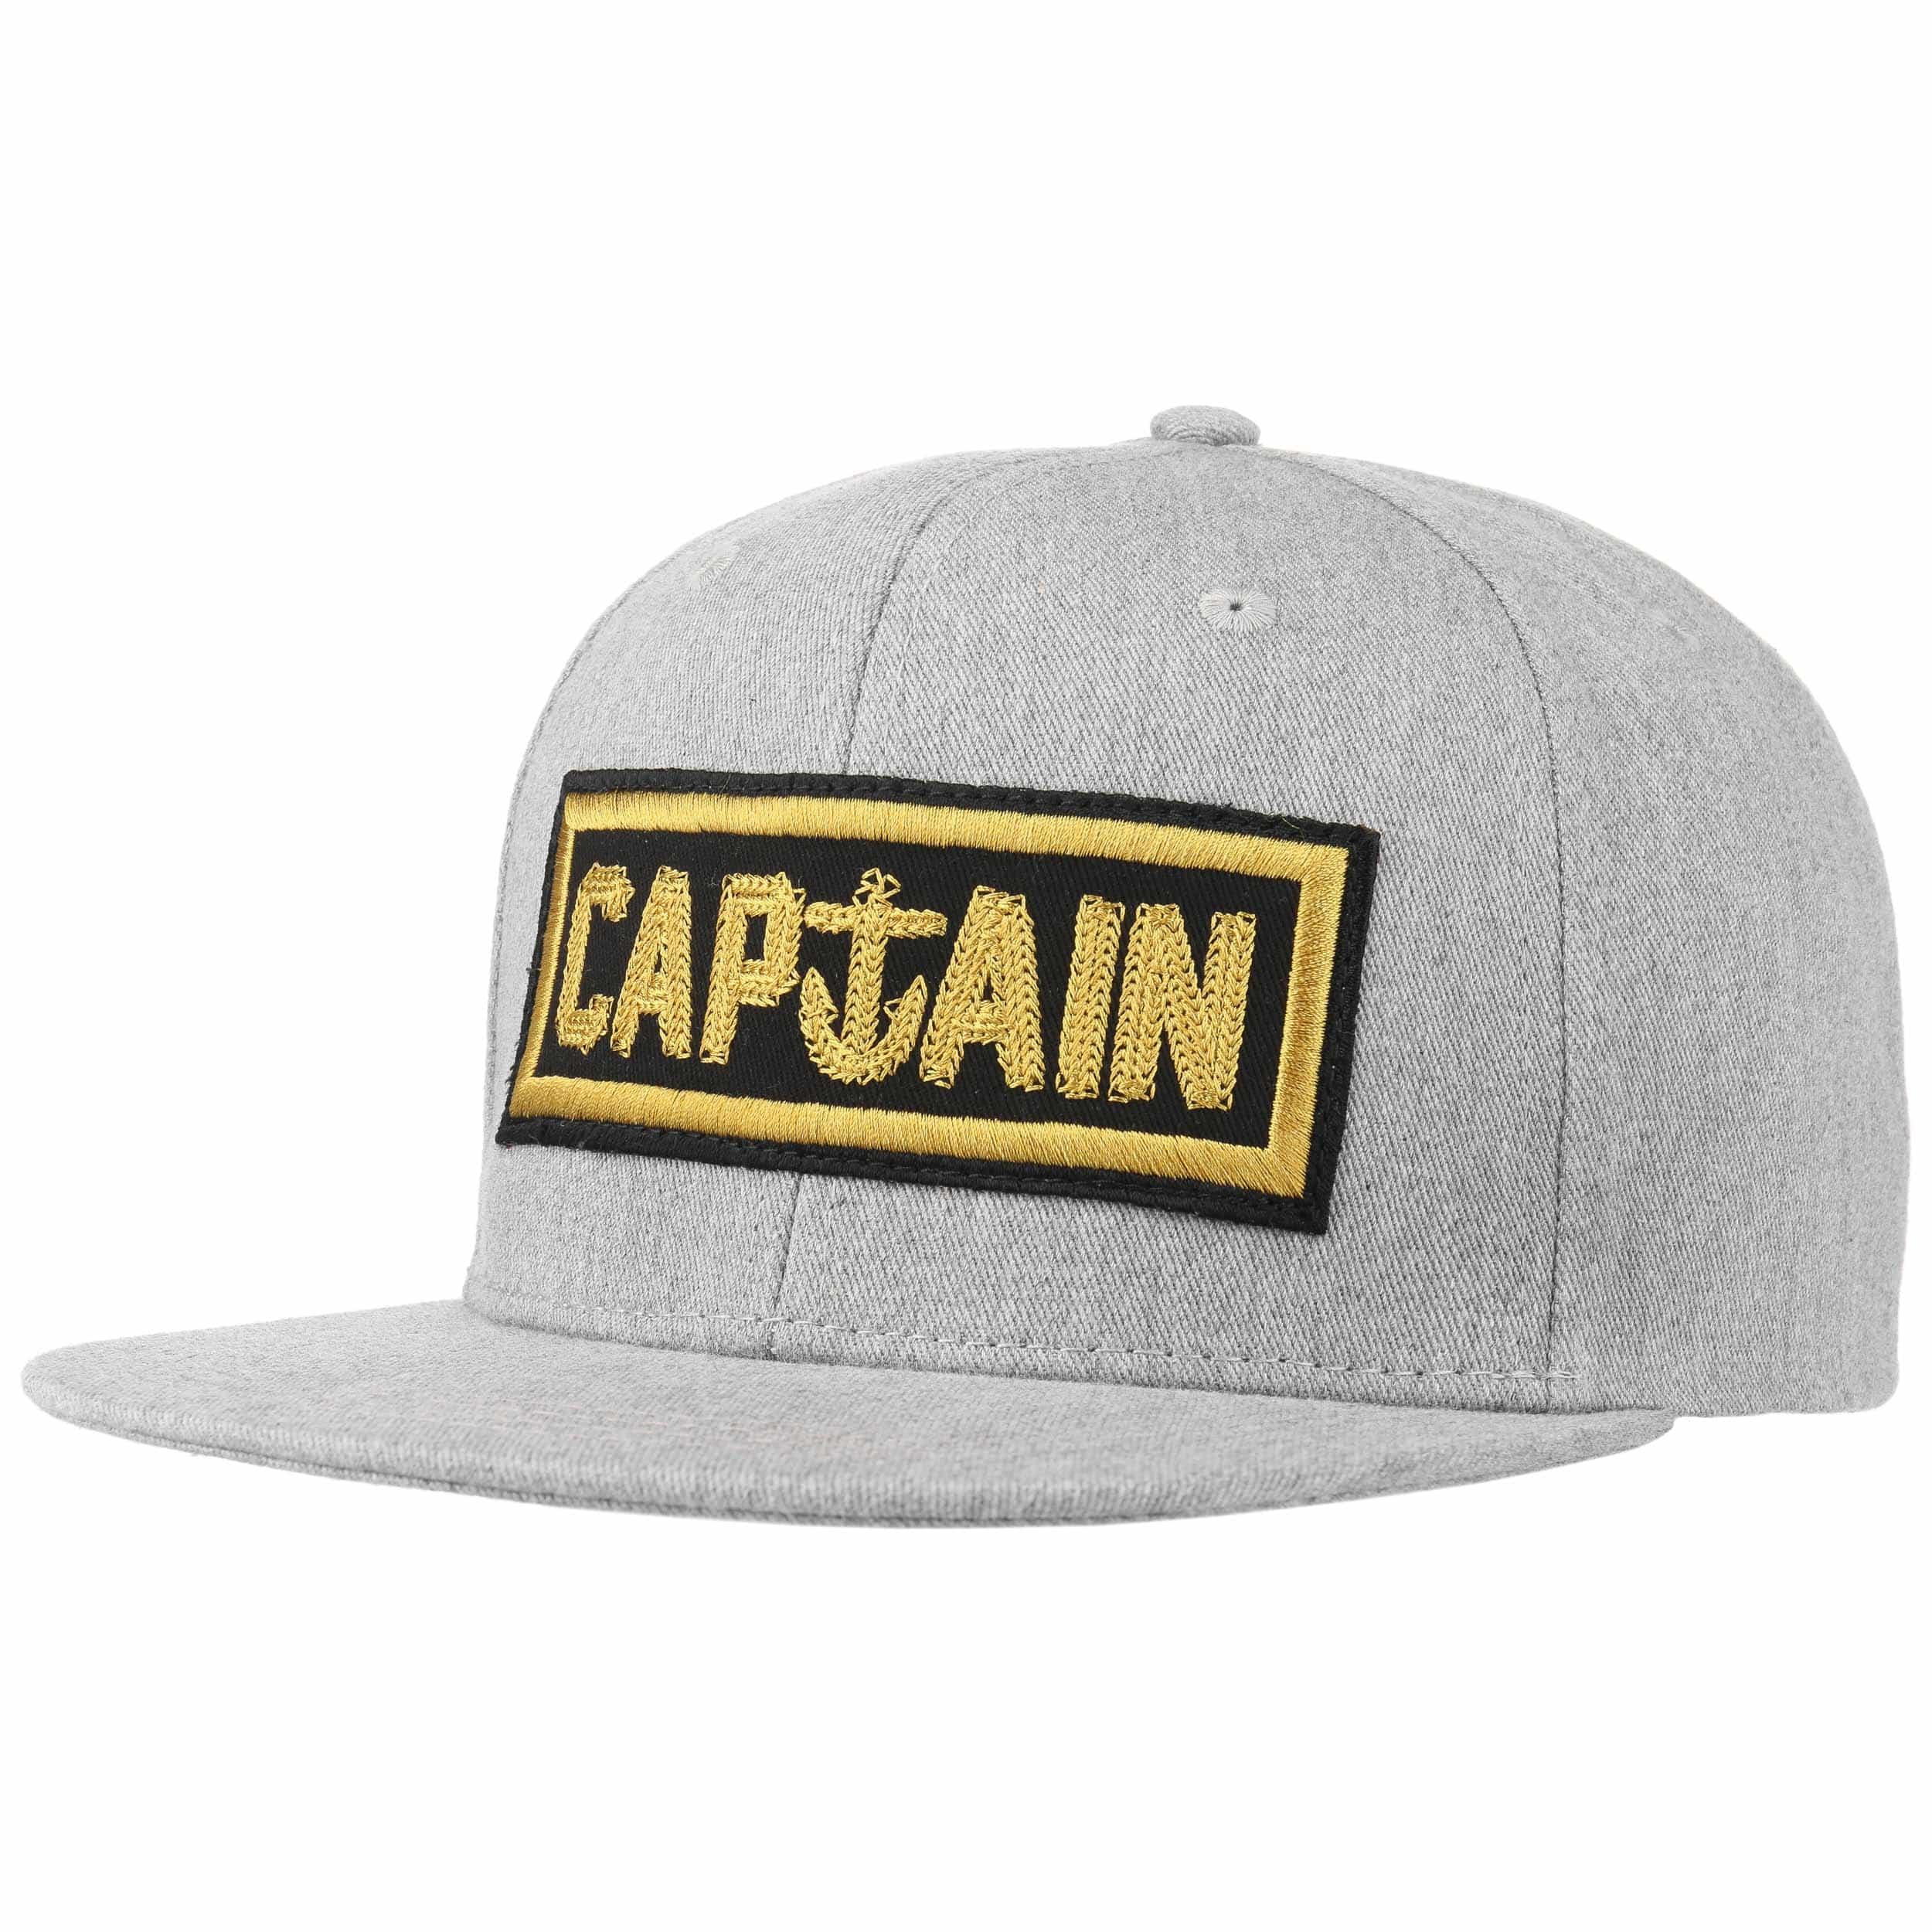 47aa609ca Naval Captain Snapback Cap by Captain Fin